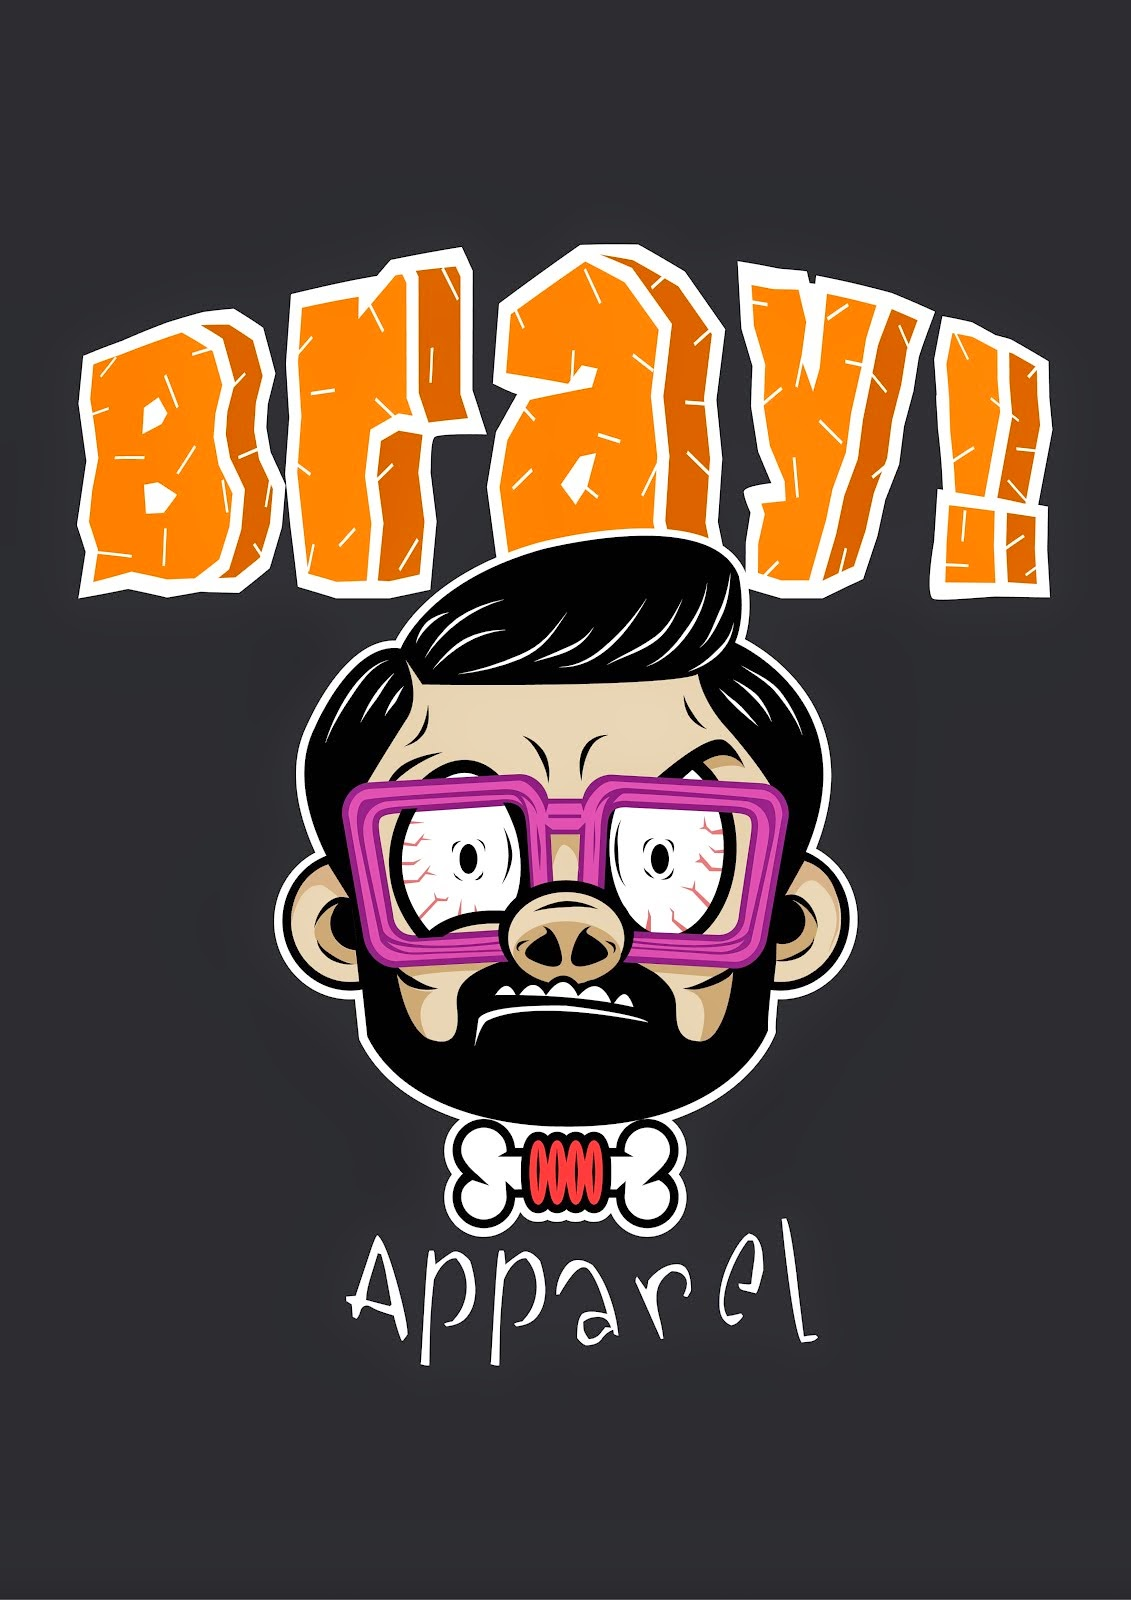 BRAY APPAREL